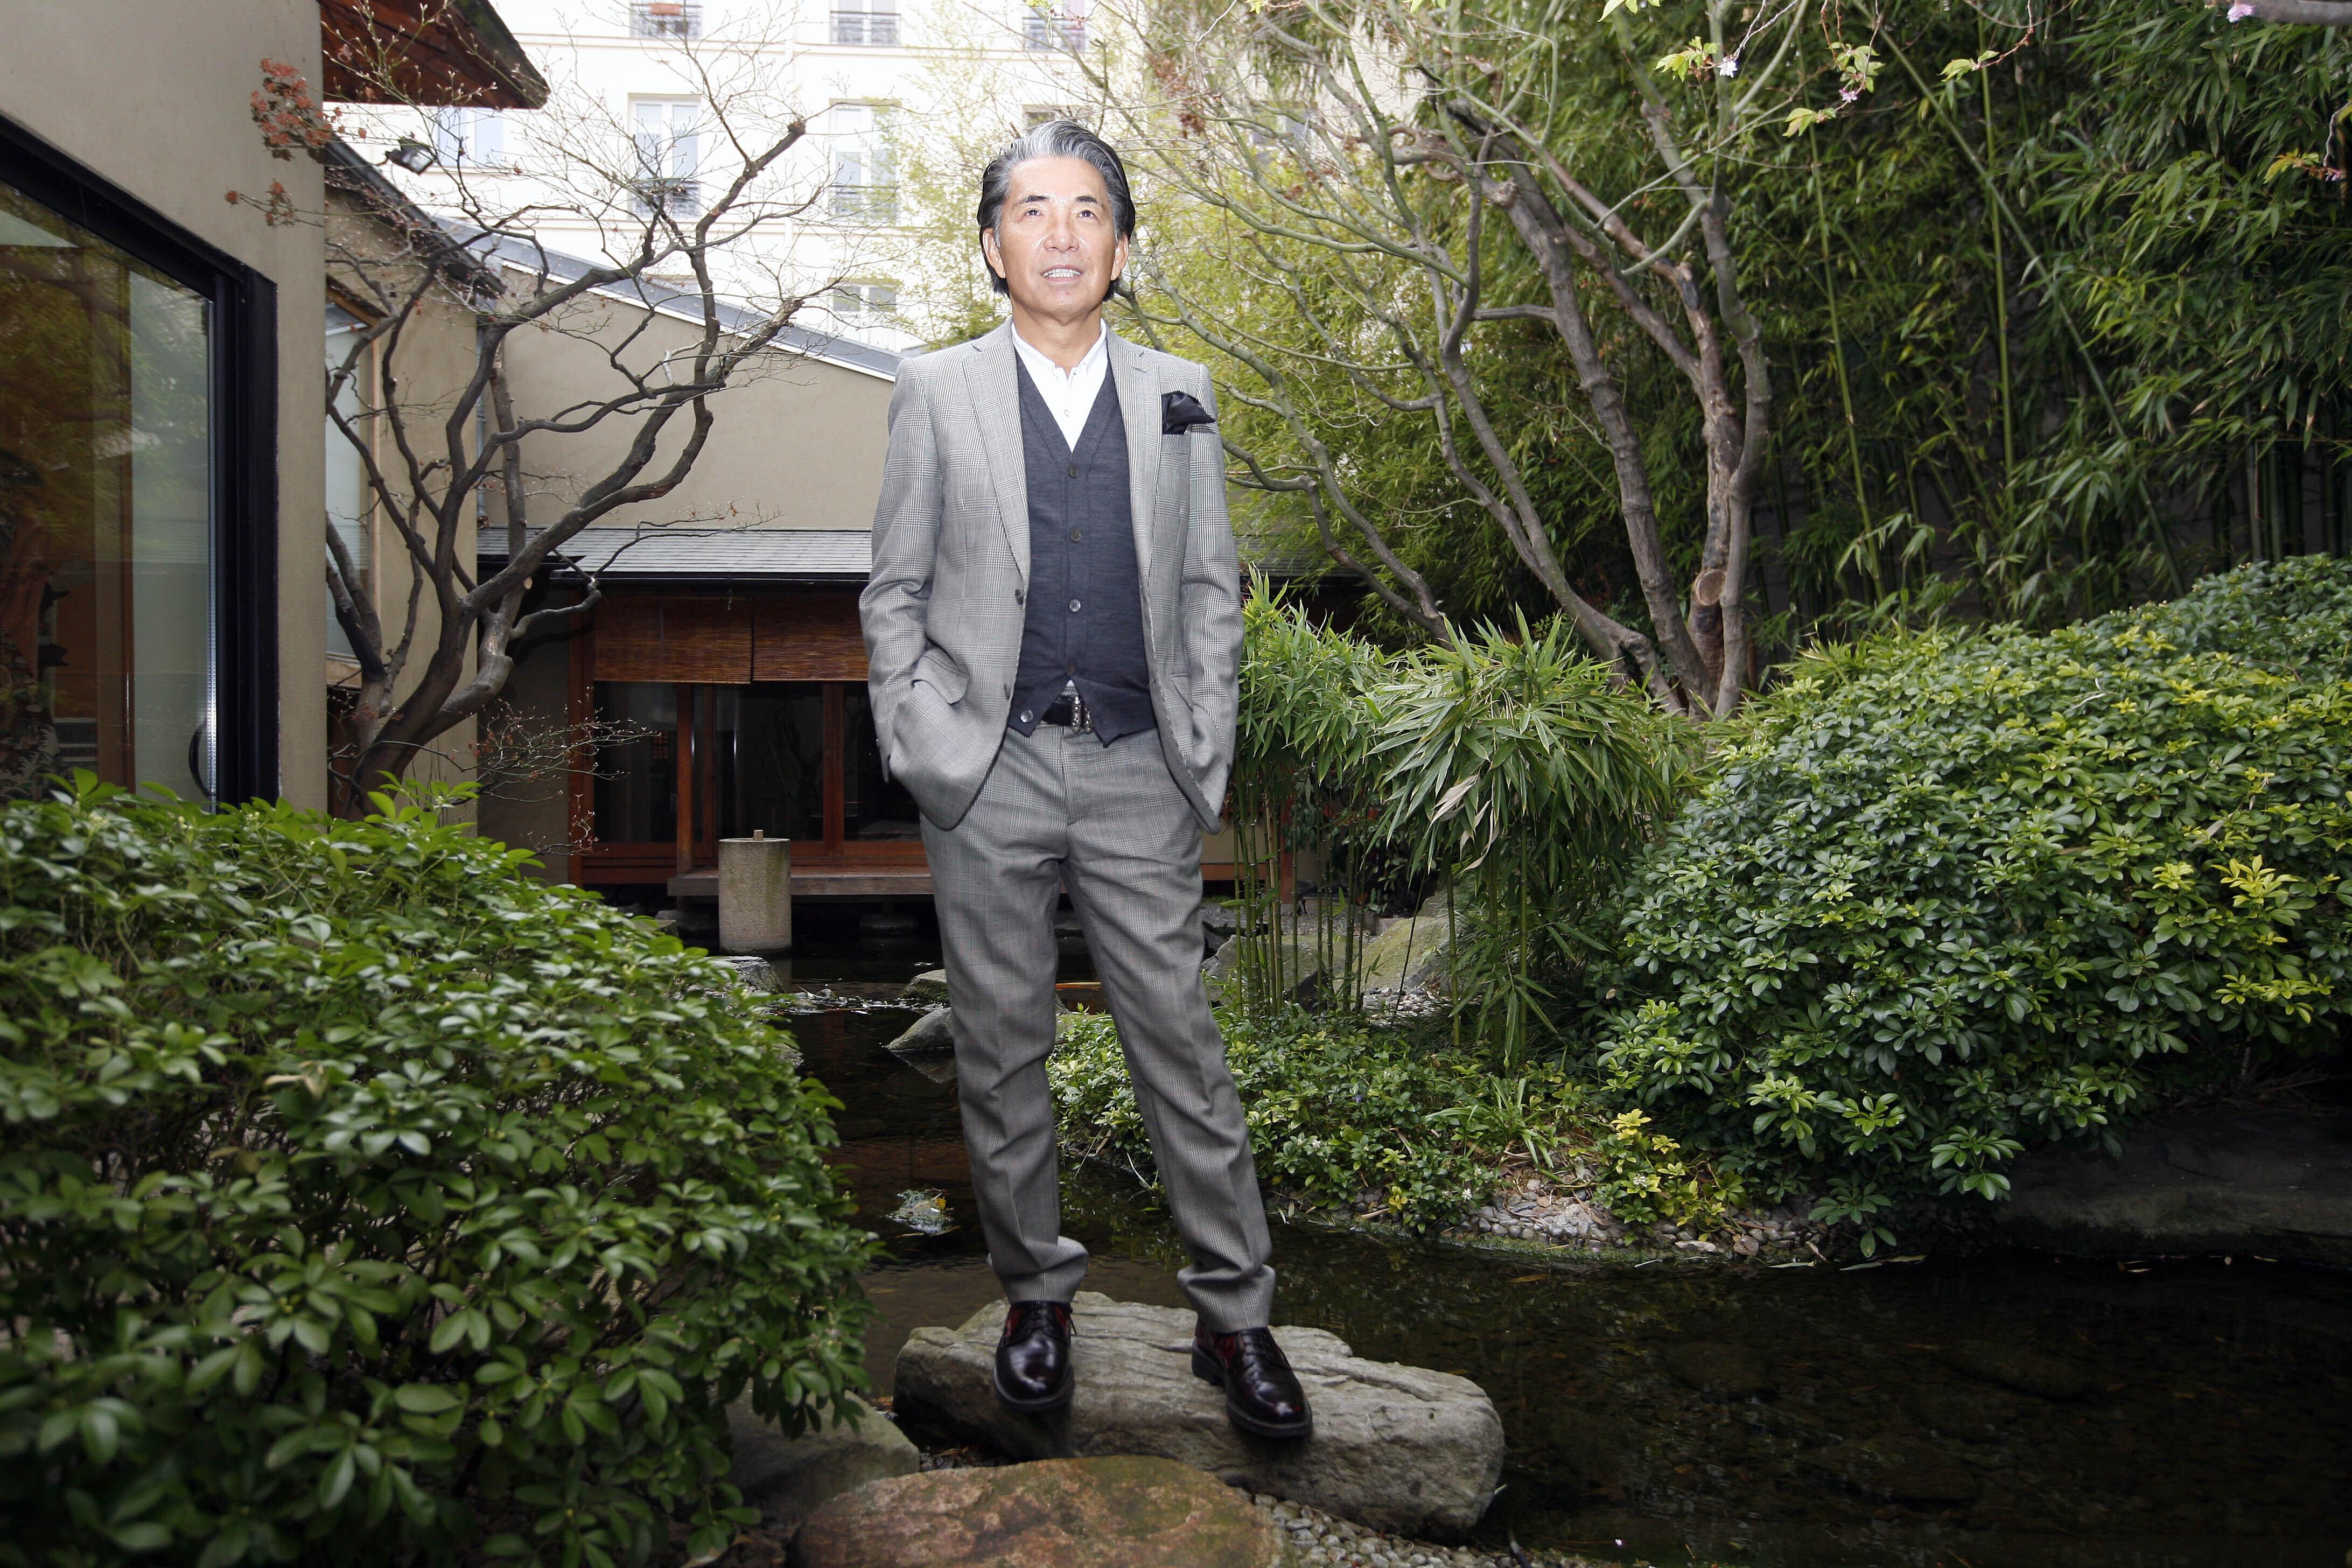 Japanese fashion designer Kenzo Takada poses outside his Paris house, on March 24, 2009.